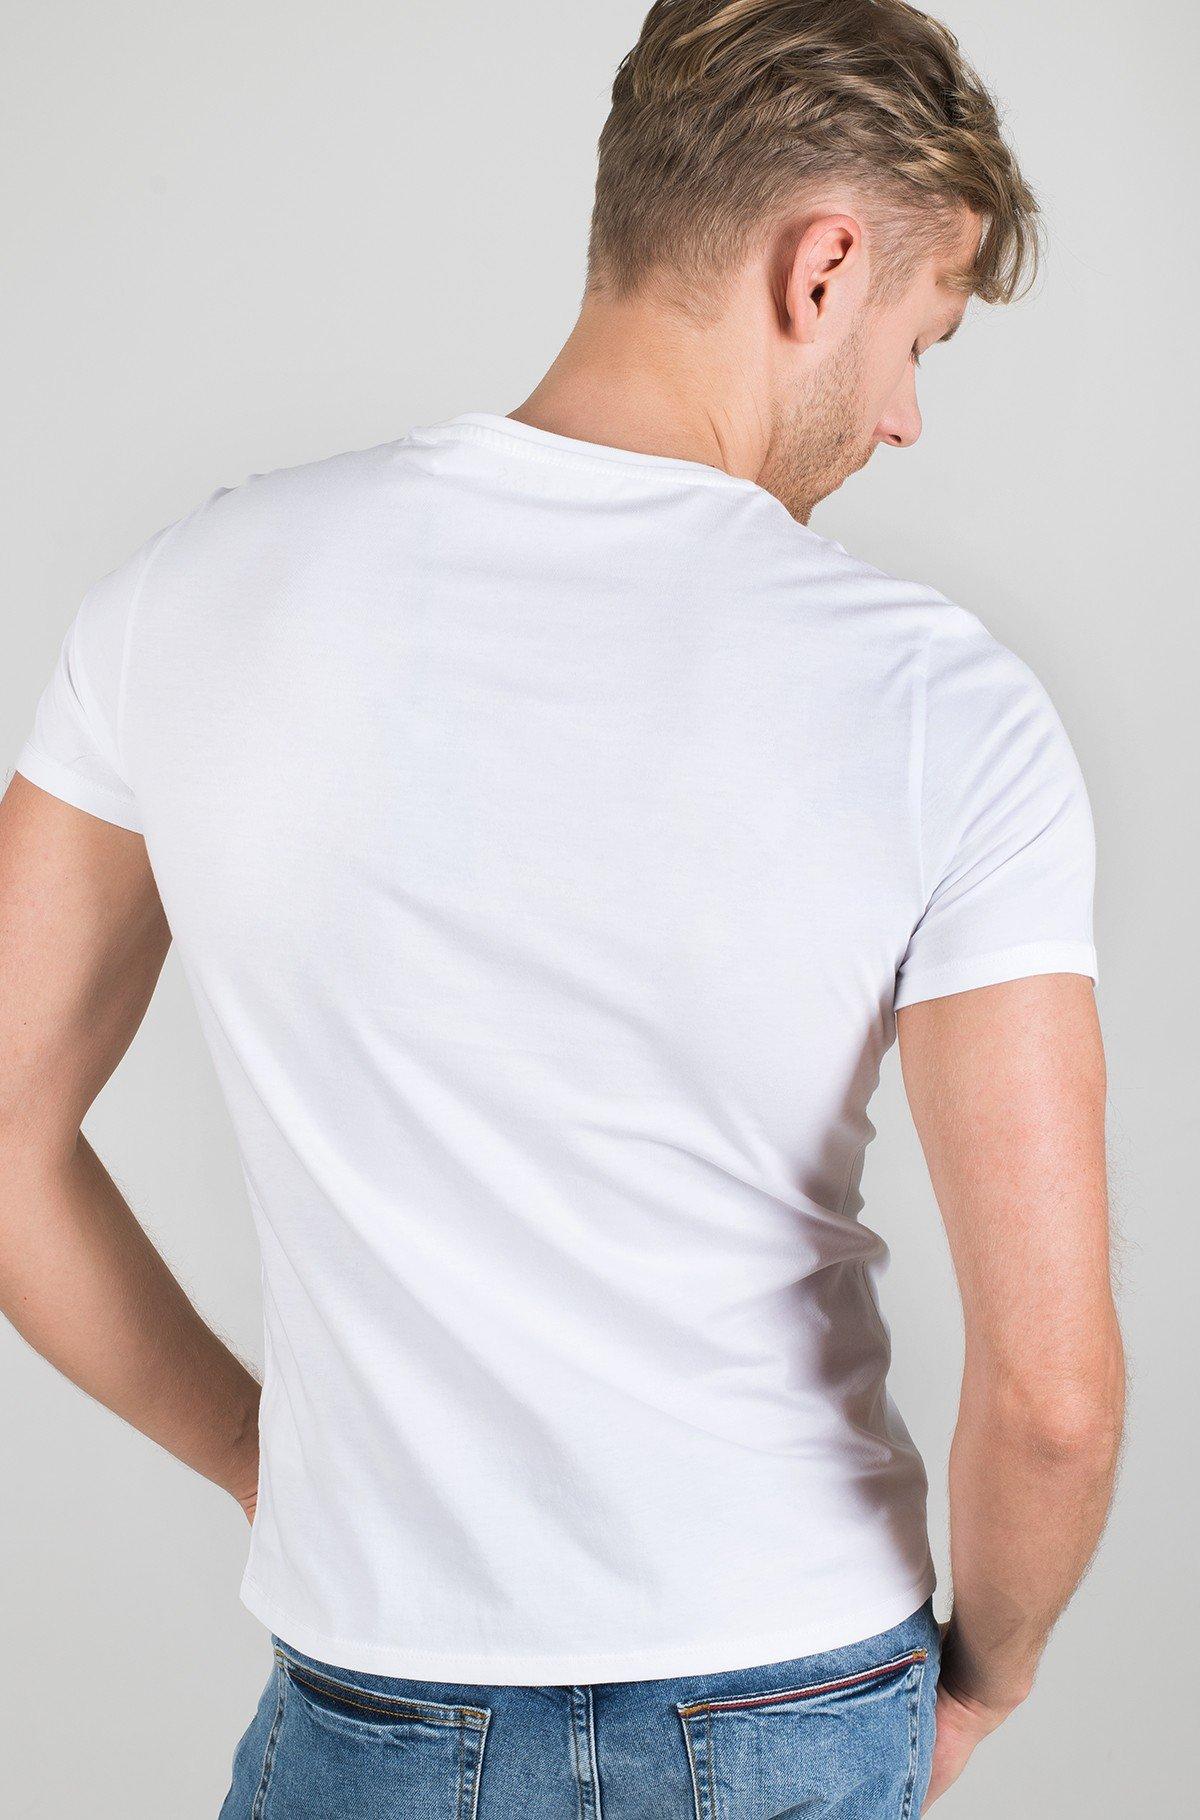 Marškinėliai M0GI71 I3Z00-full-2